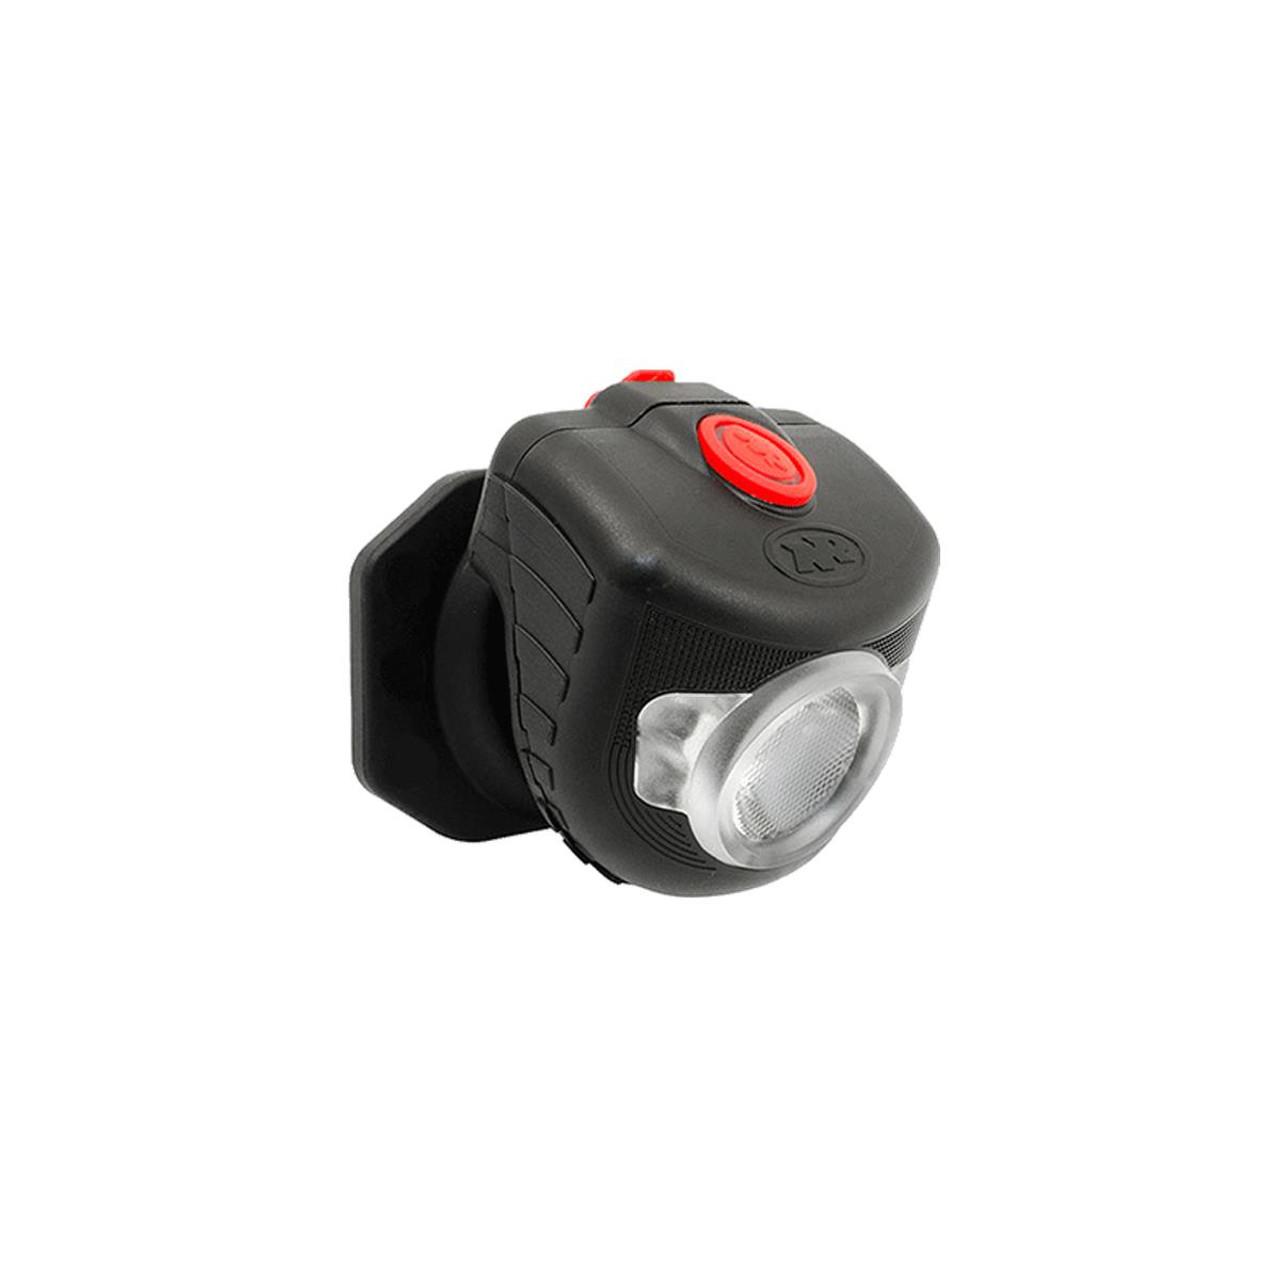 NiteRider Adventure 320 Pro LED Headlight with Helmet Stick On Pivot Mount